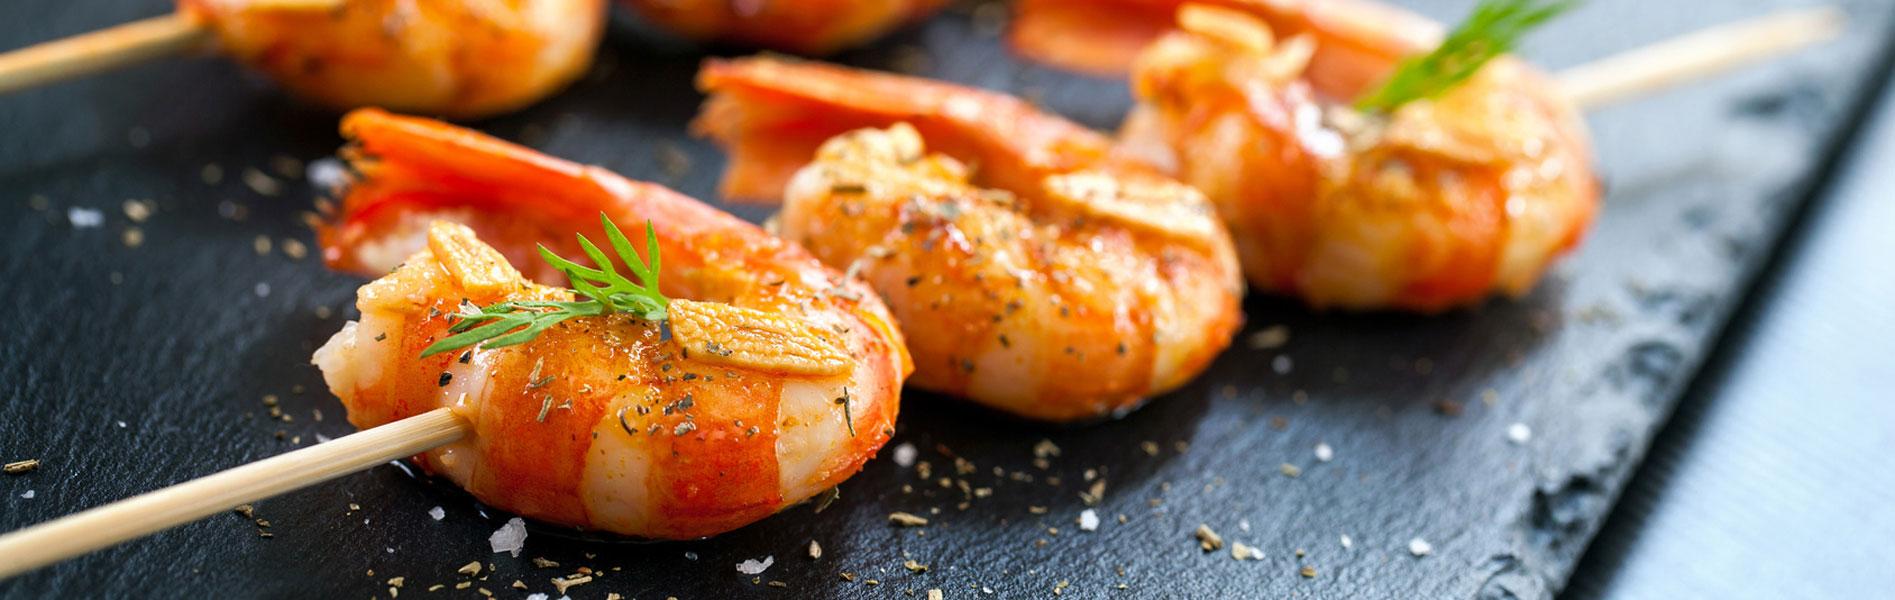 Unikorn Catering - Fingerfood Mediterran